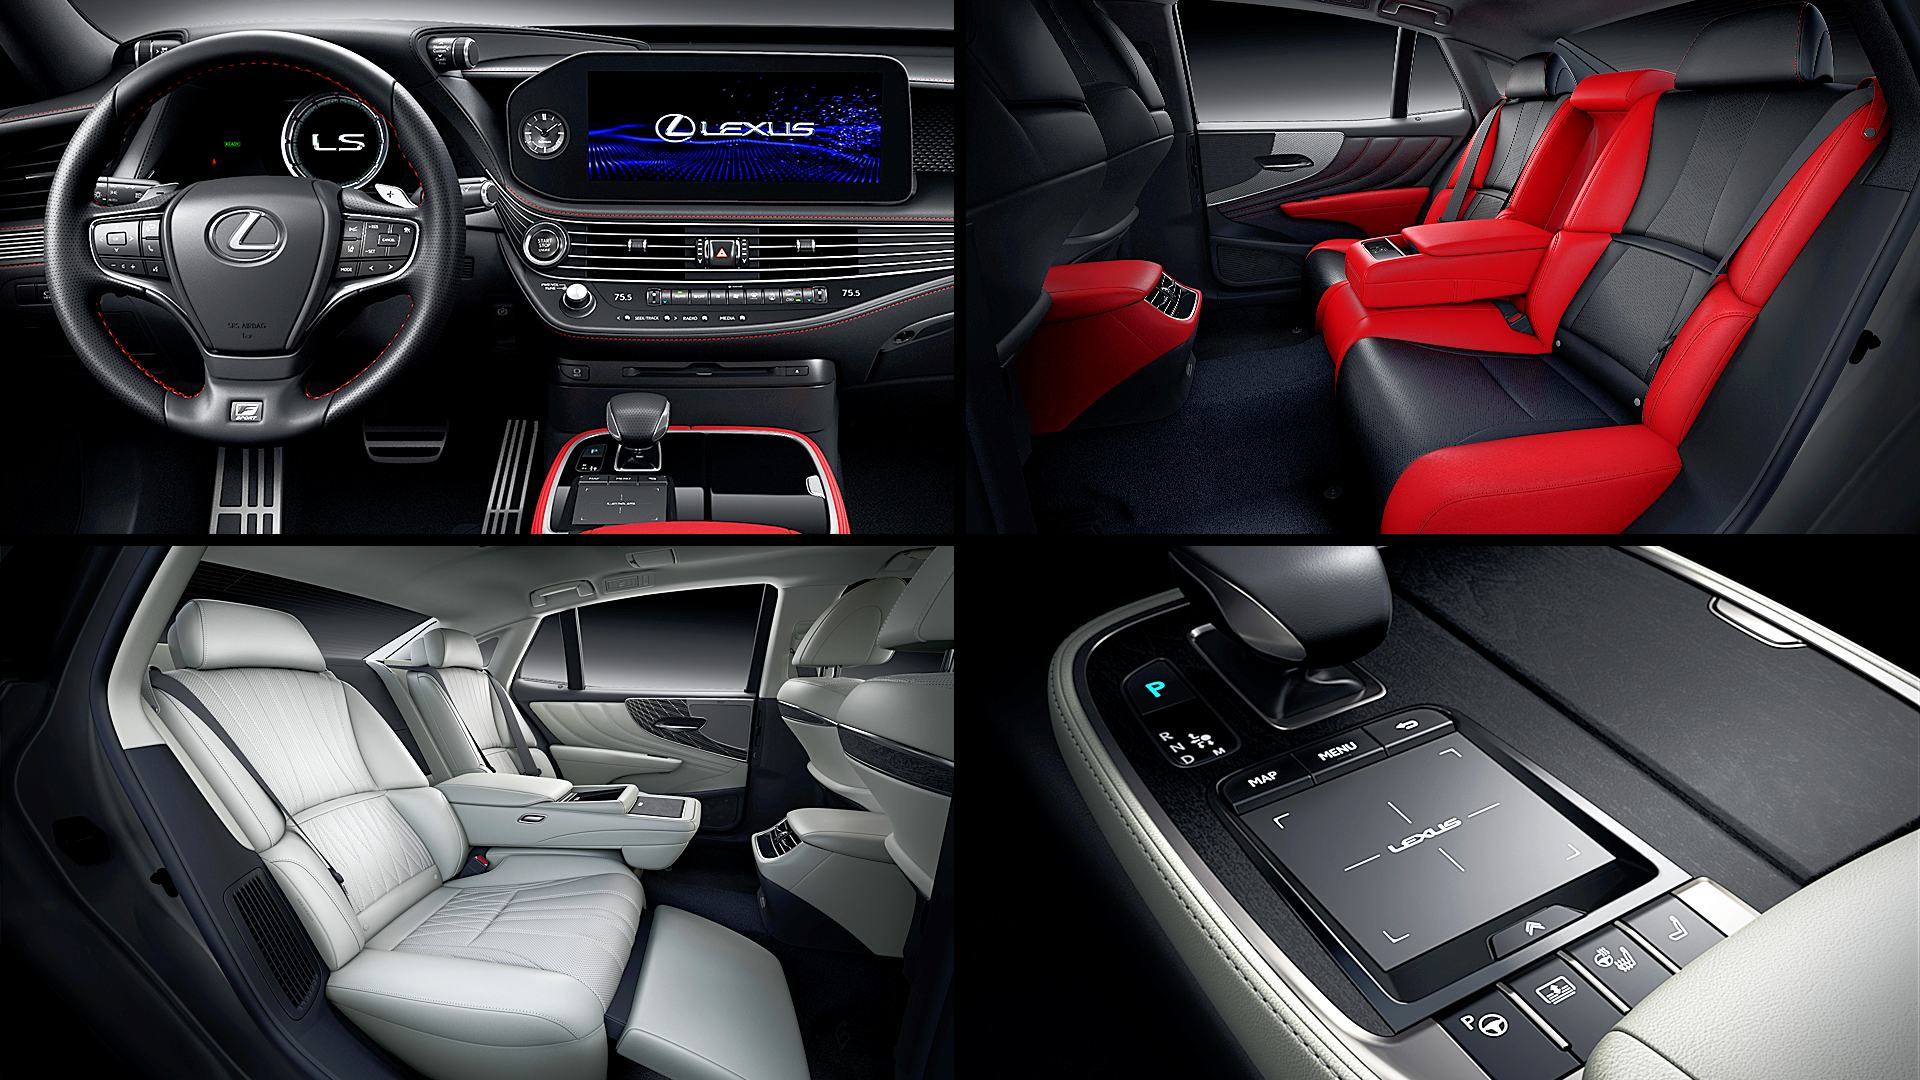 2021 Lexus Ls 460 Release Date and Concept